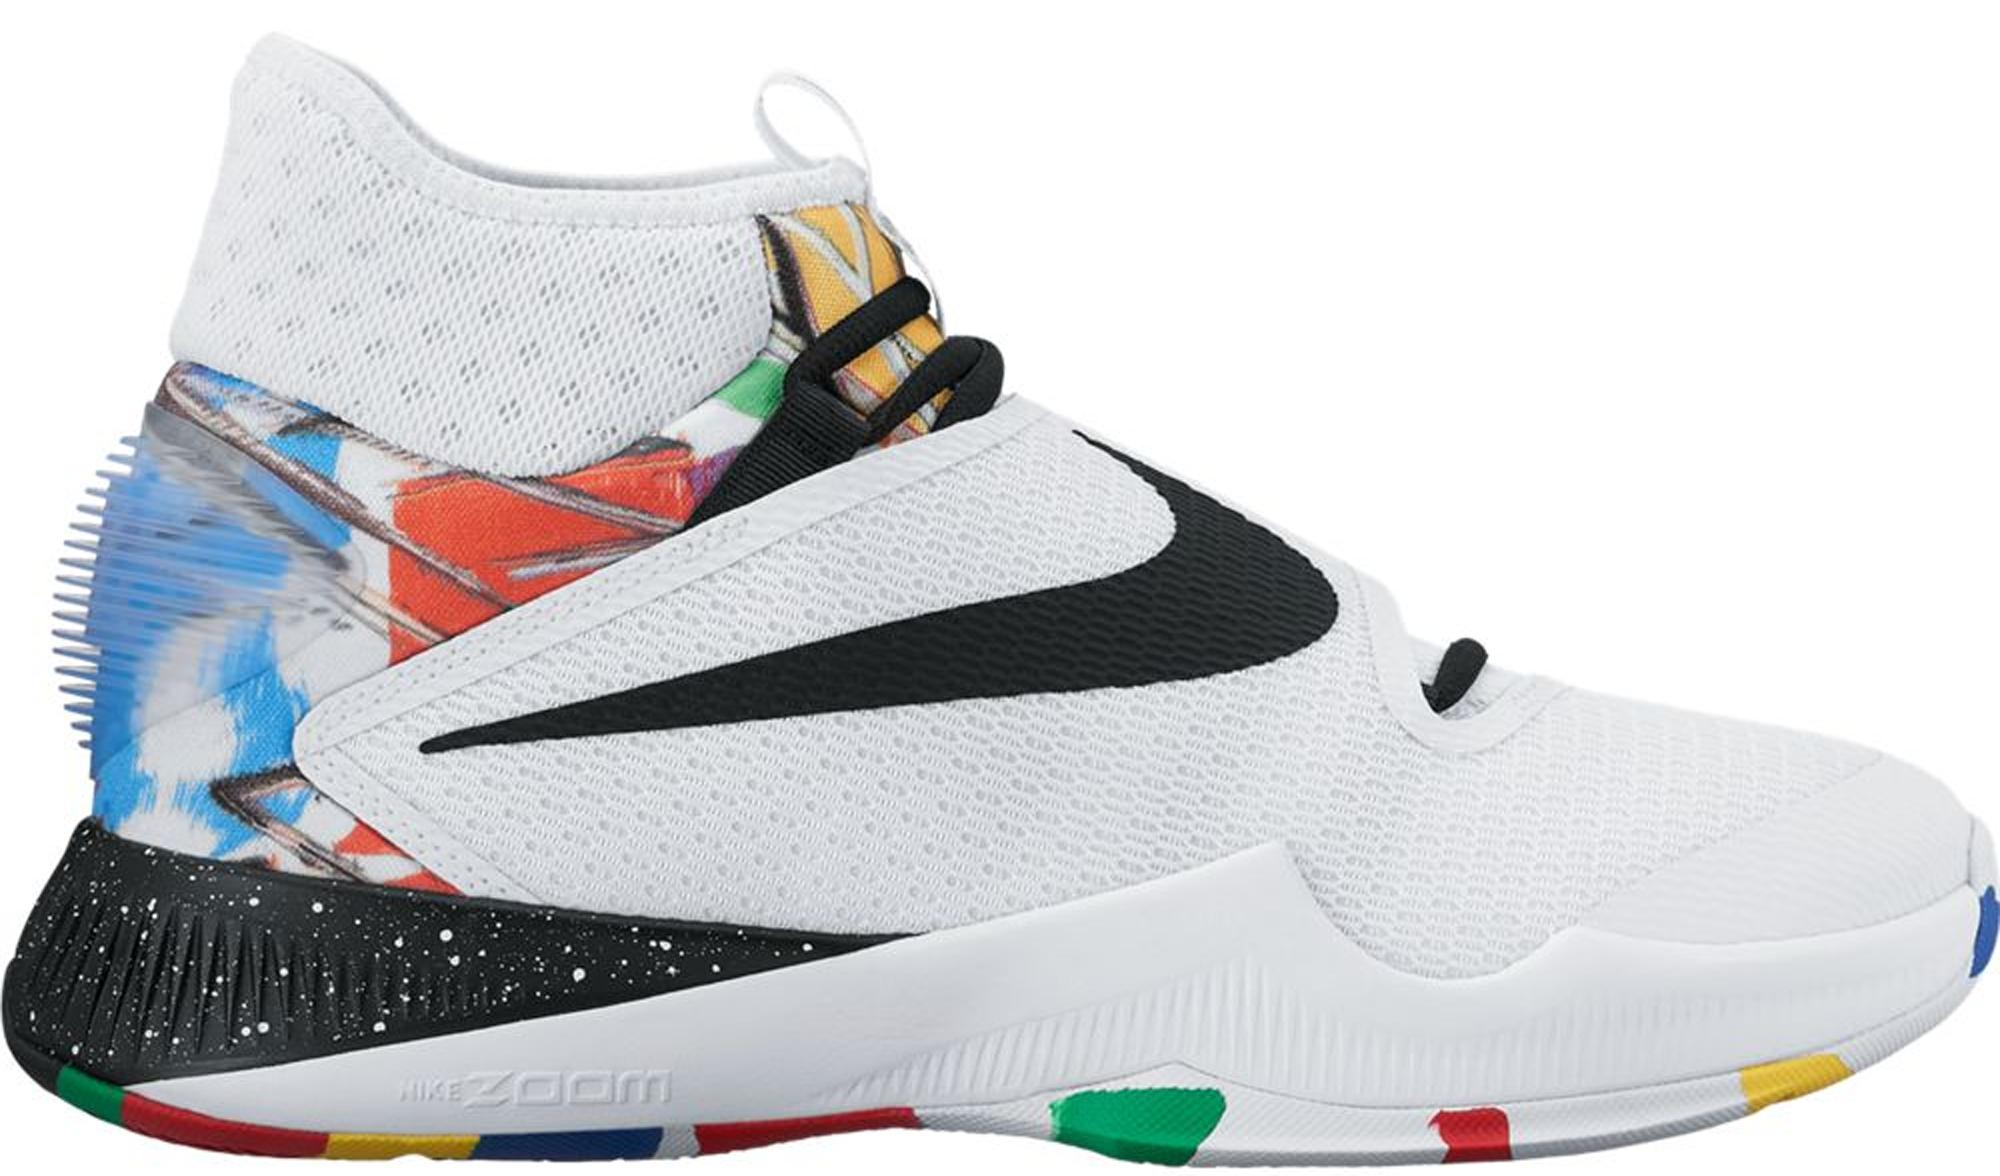 Nike Zoom Hyperrev 2016 Net Collector's